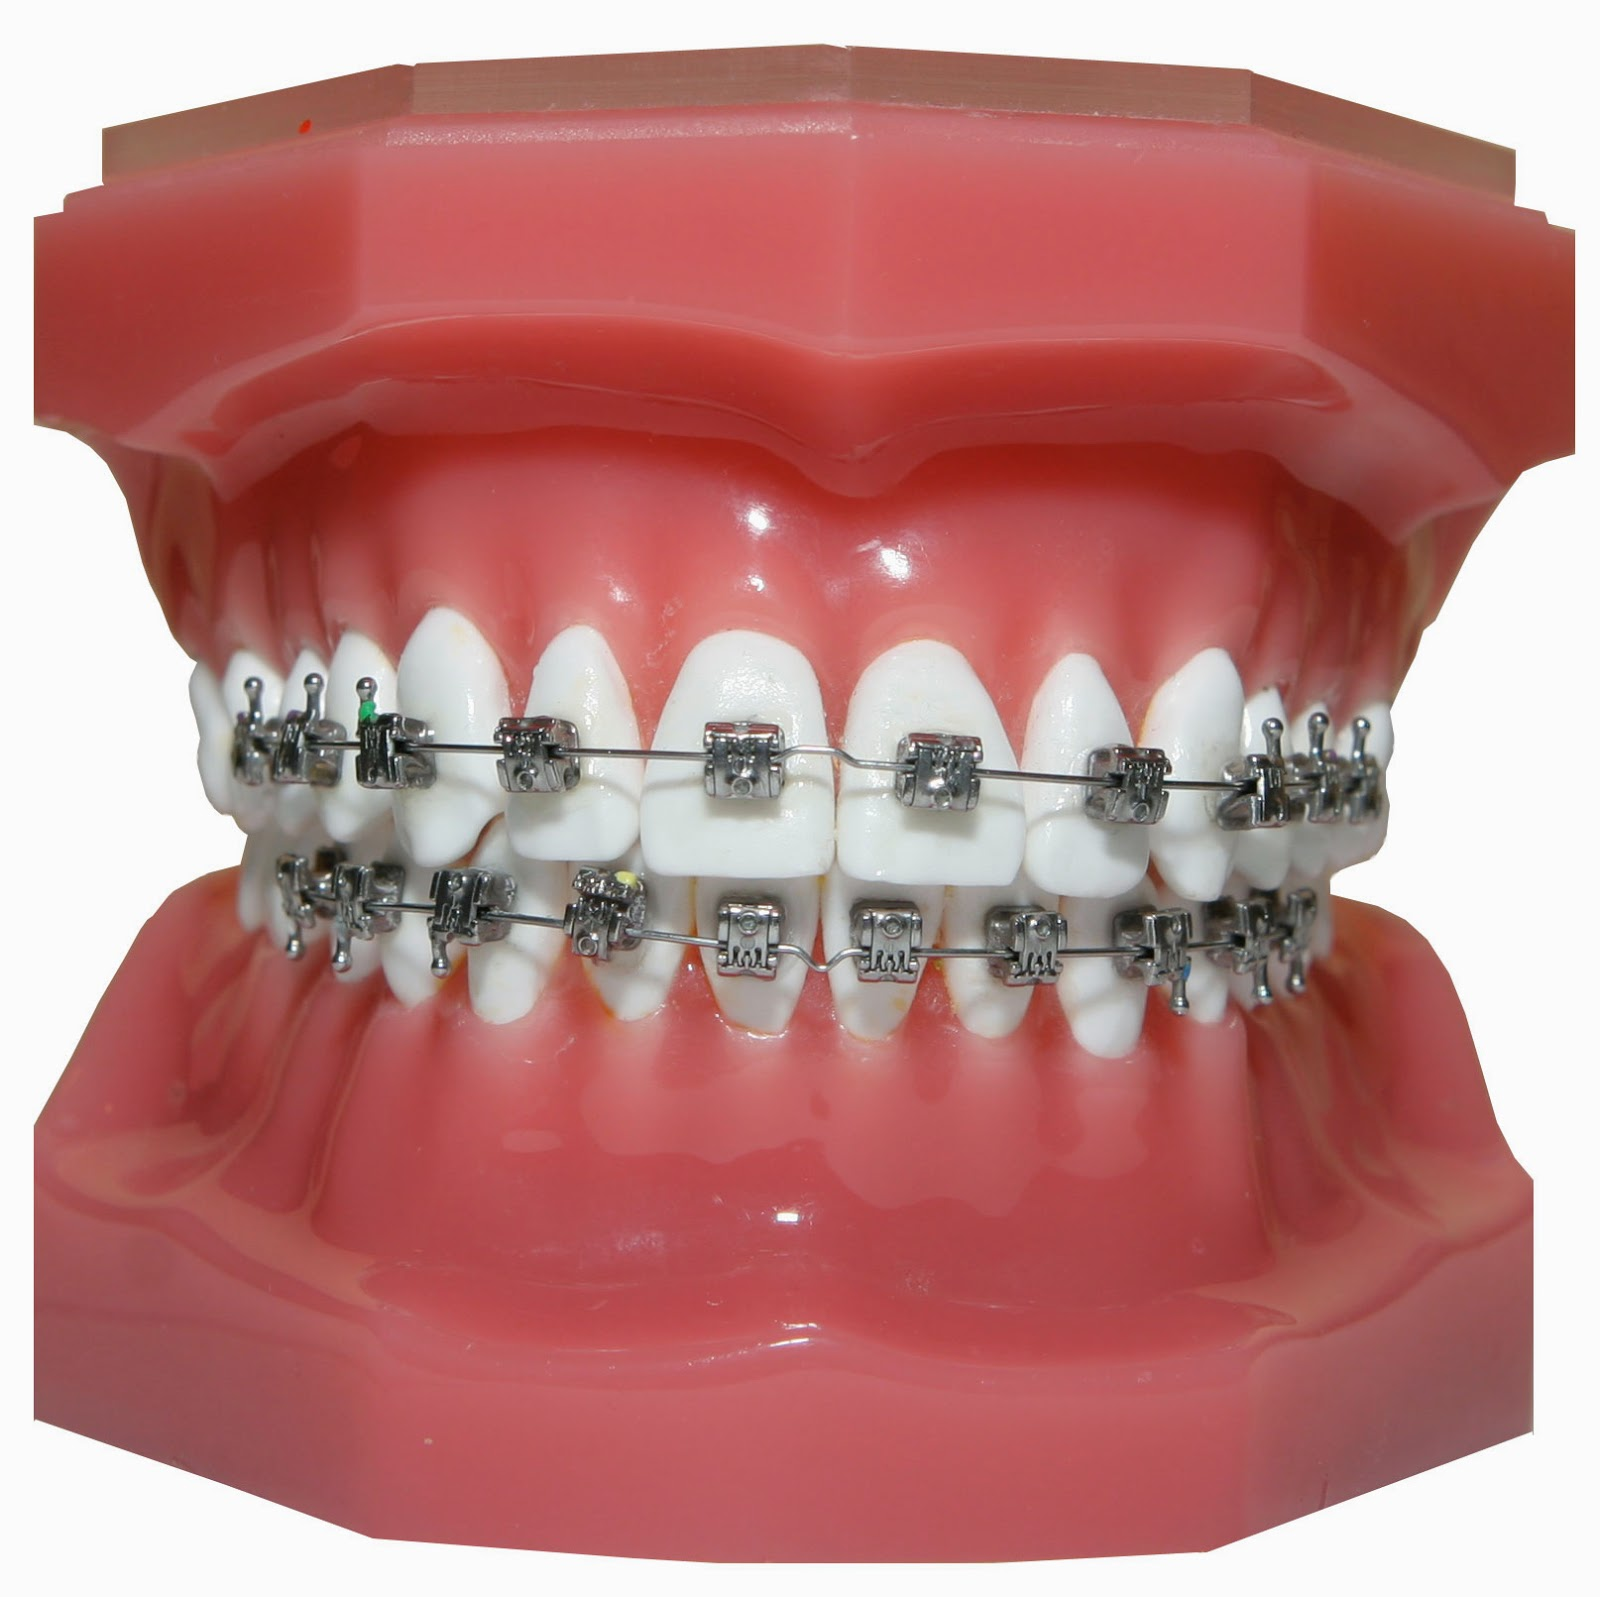 Get straight teeth - Get Straight Teeth 27